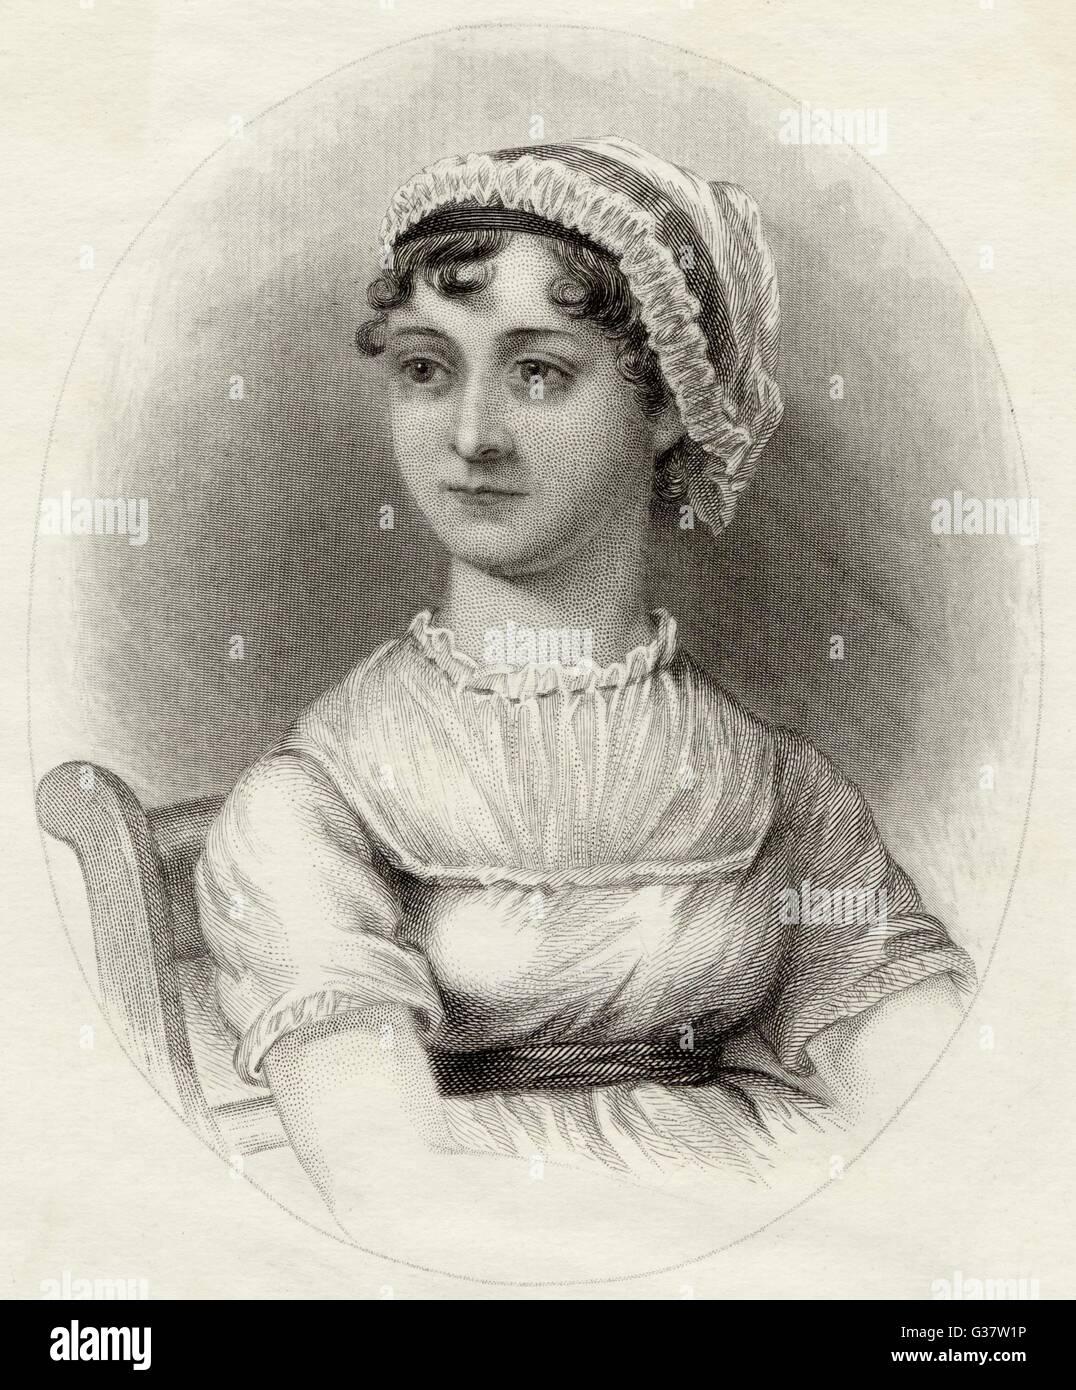 JANE AUSTEN novelista inglesa Fecha: 1775 - 1817 Imagen De Stock